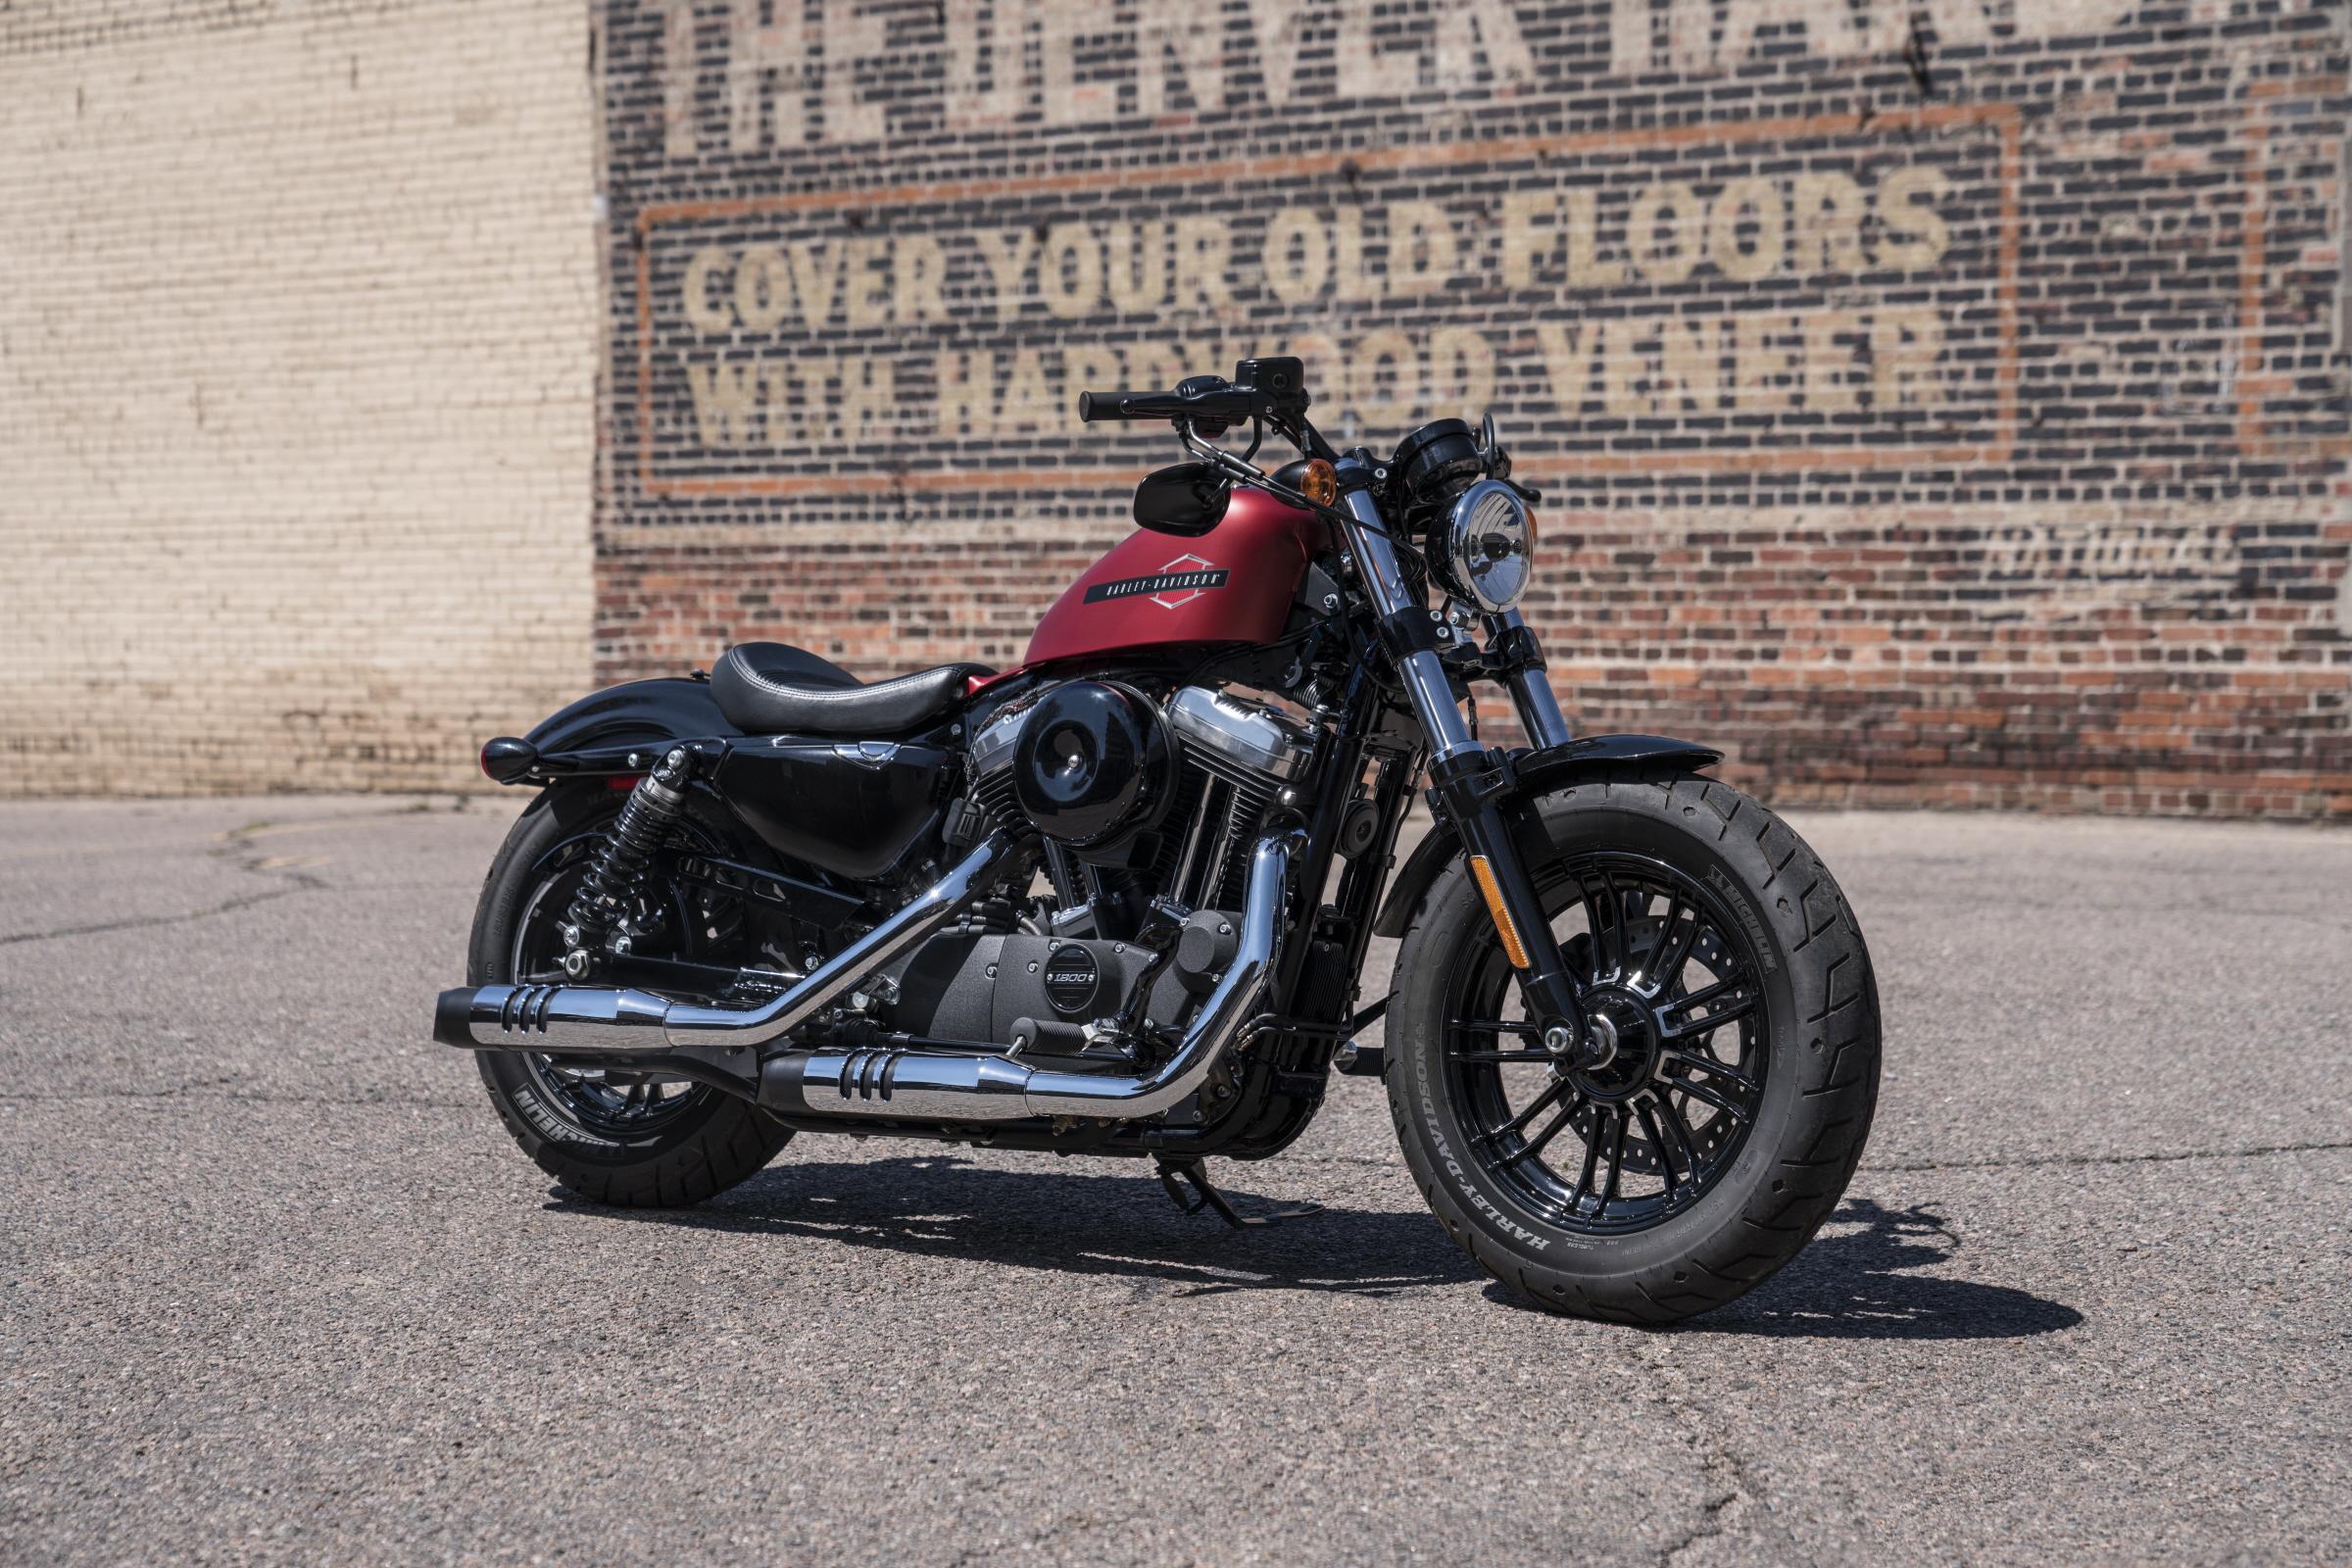 Black and Red Harley Davidson 48